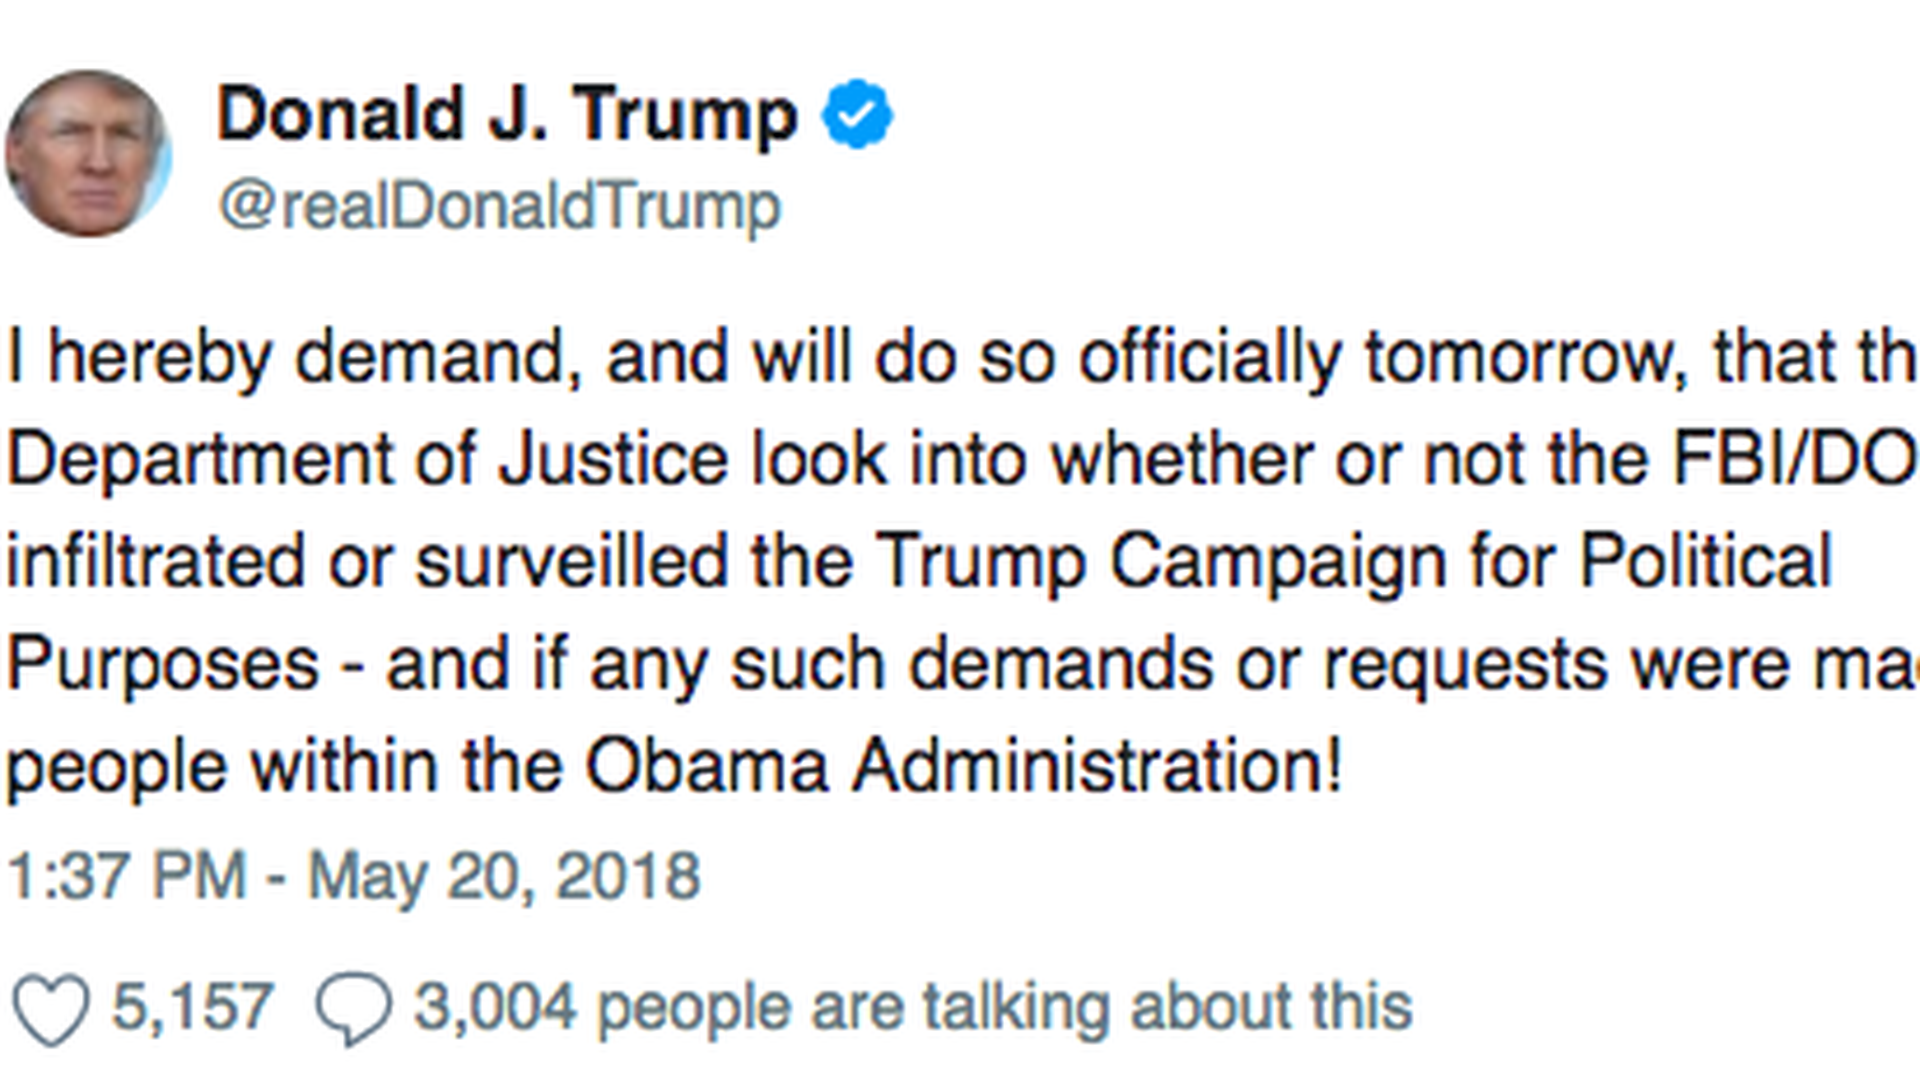 Trump demands DOJ investigation into FBI surveillance of his campaign